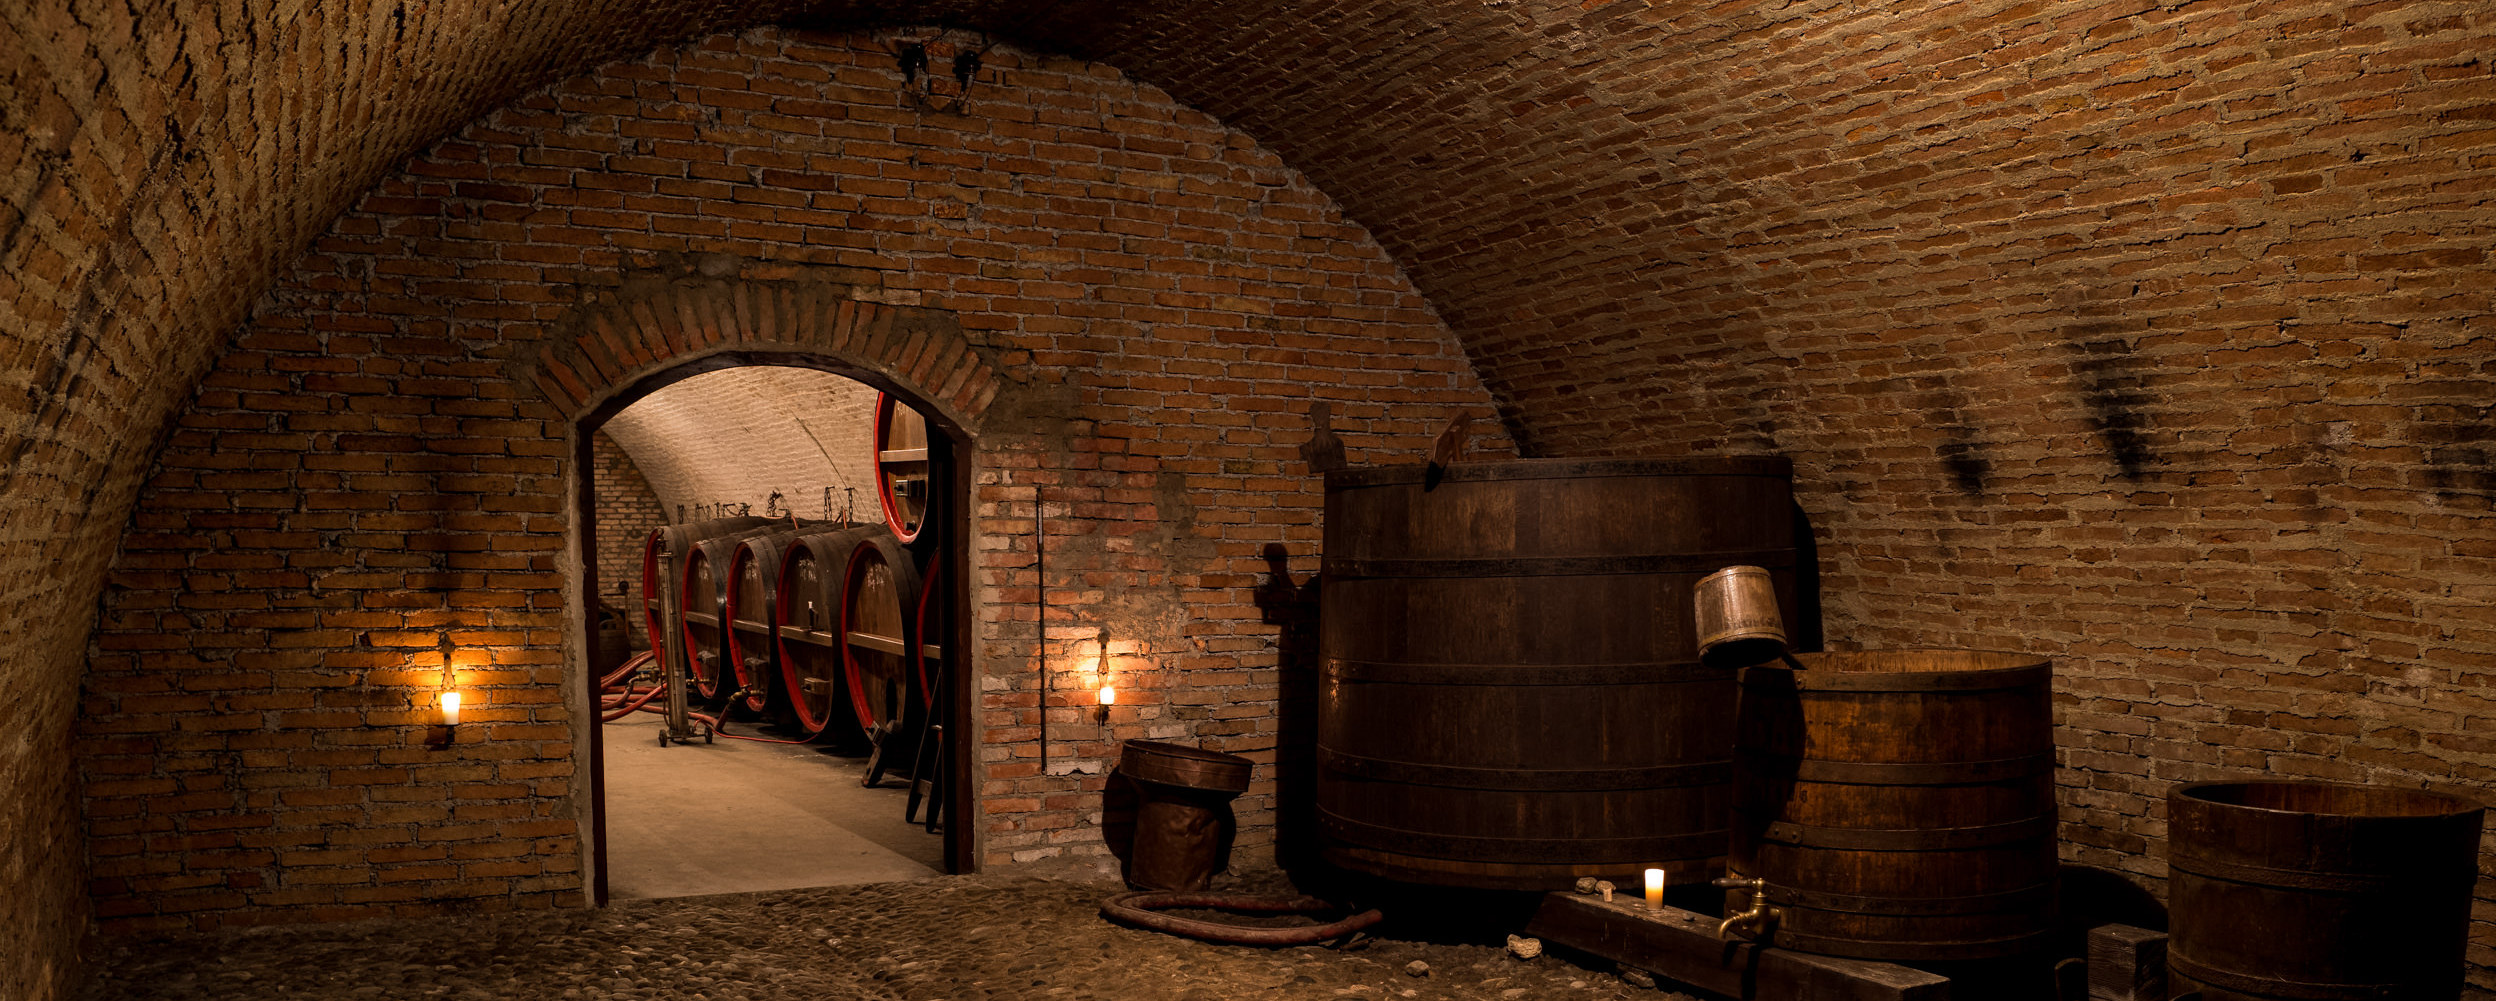 Besuch in den bierigen Katakomben